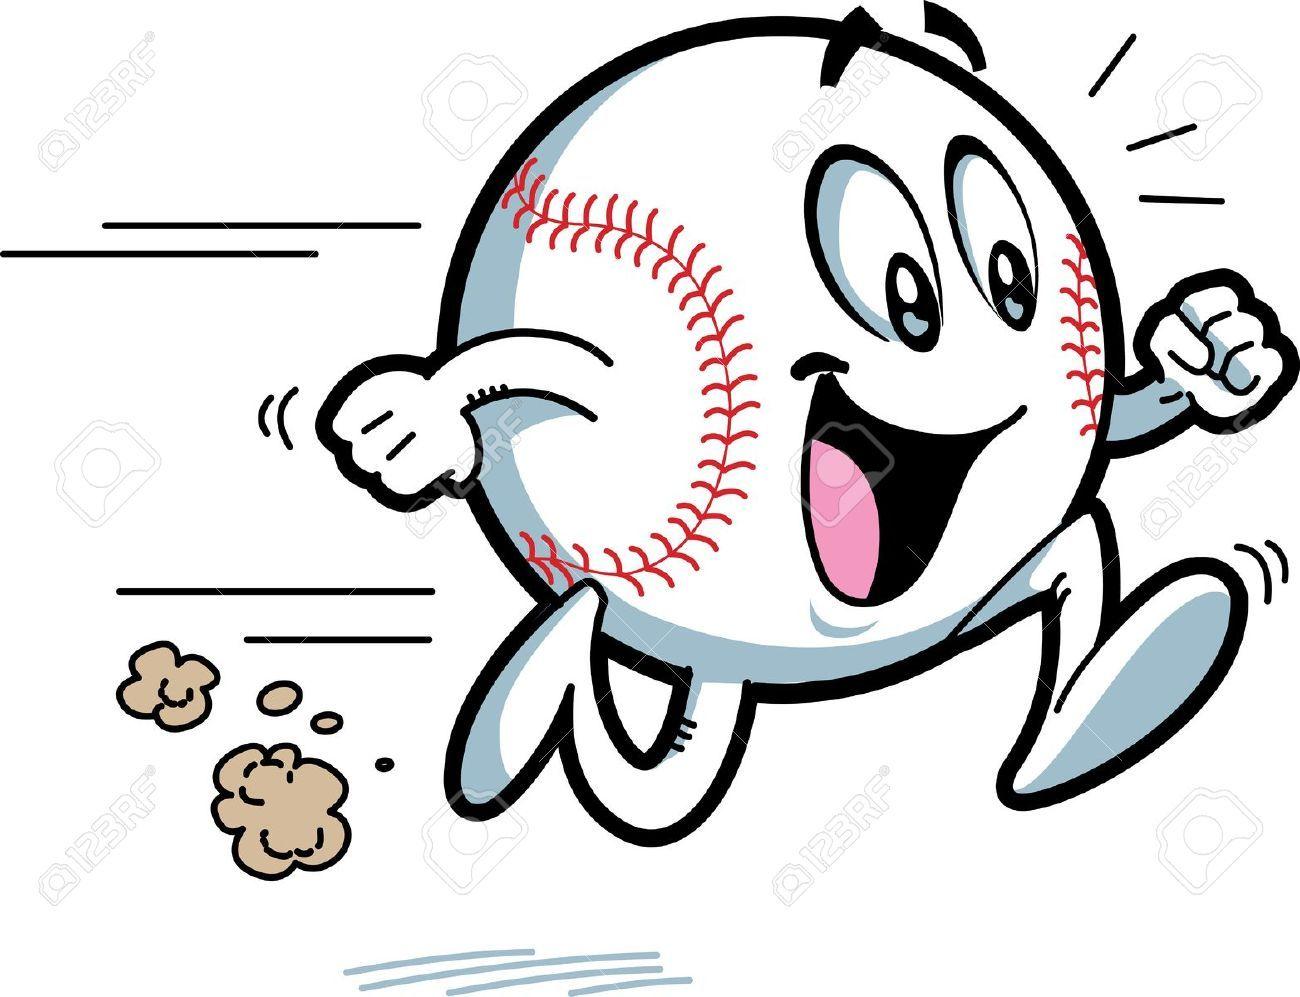 Animated Cartoon Happy Running Baseball With Big Smile Illustration Baseball Theme Birthday Cartoon Clip Art Smile Illustration